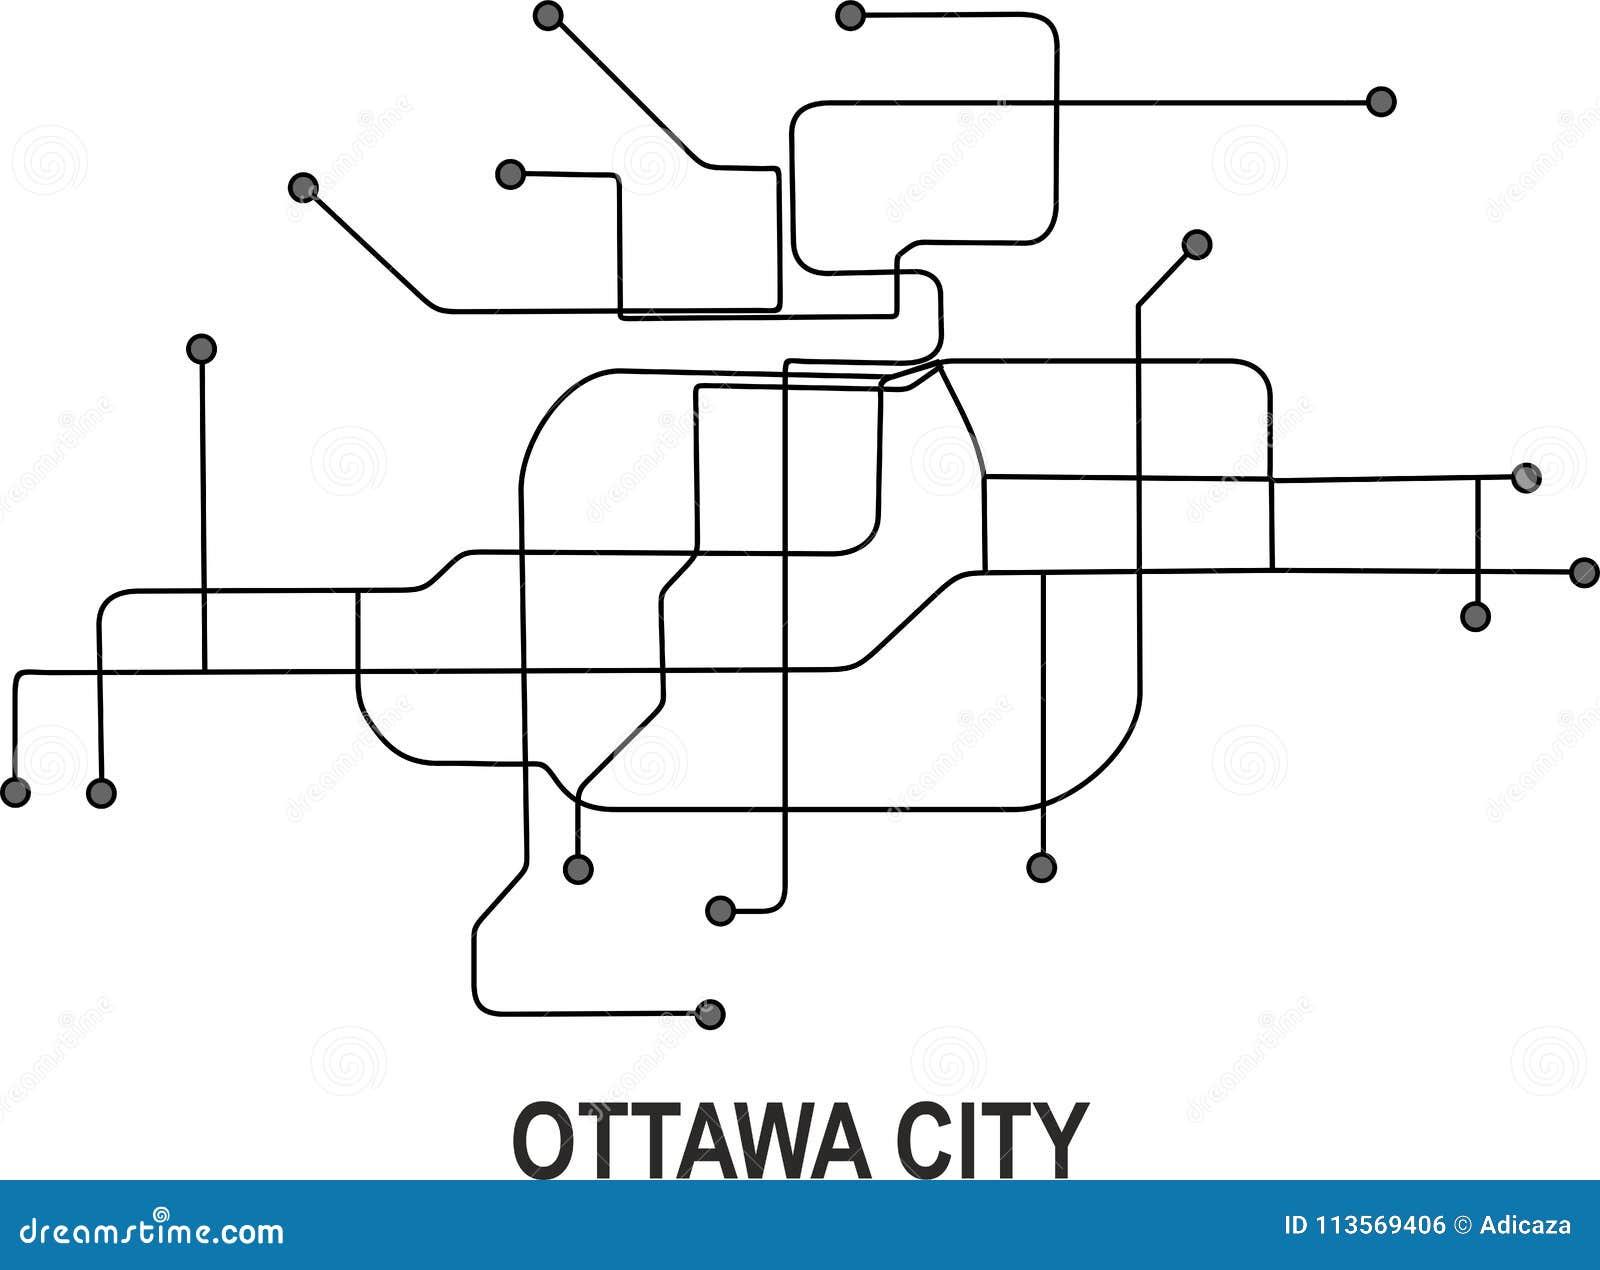 Ottawa Subway Map.Ottawa City Map Stock Vector Illustration Of Format 113569406